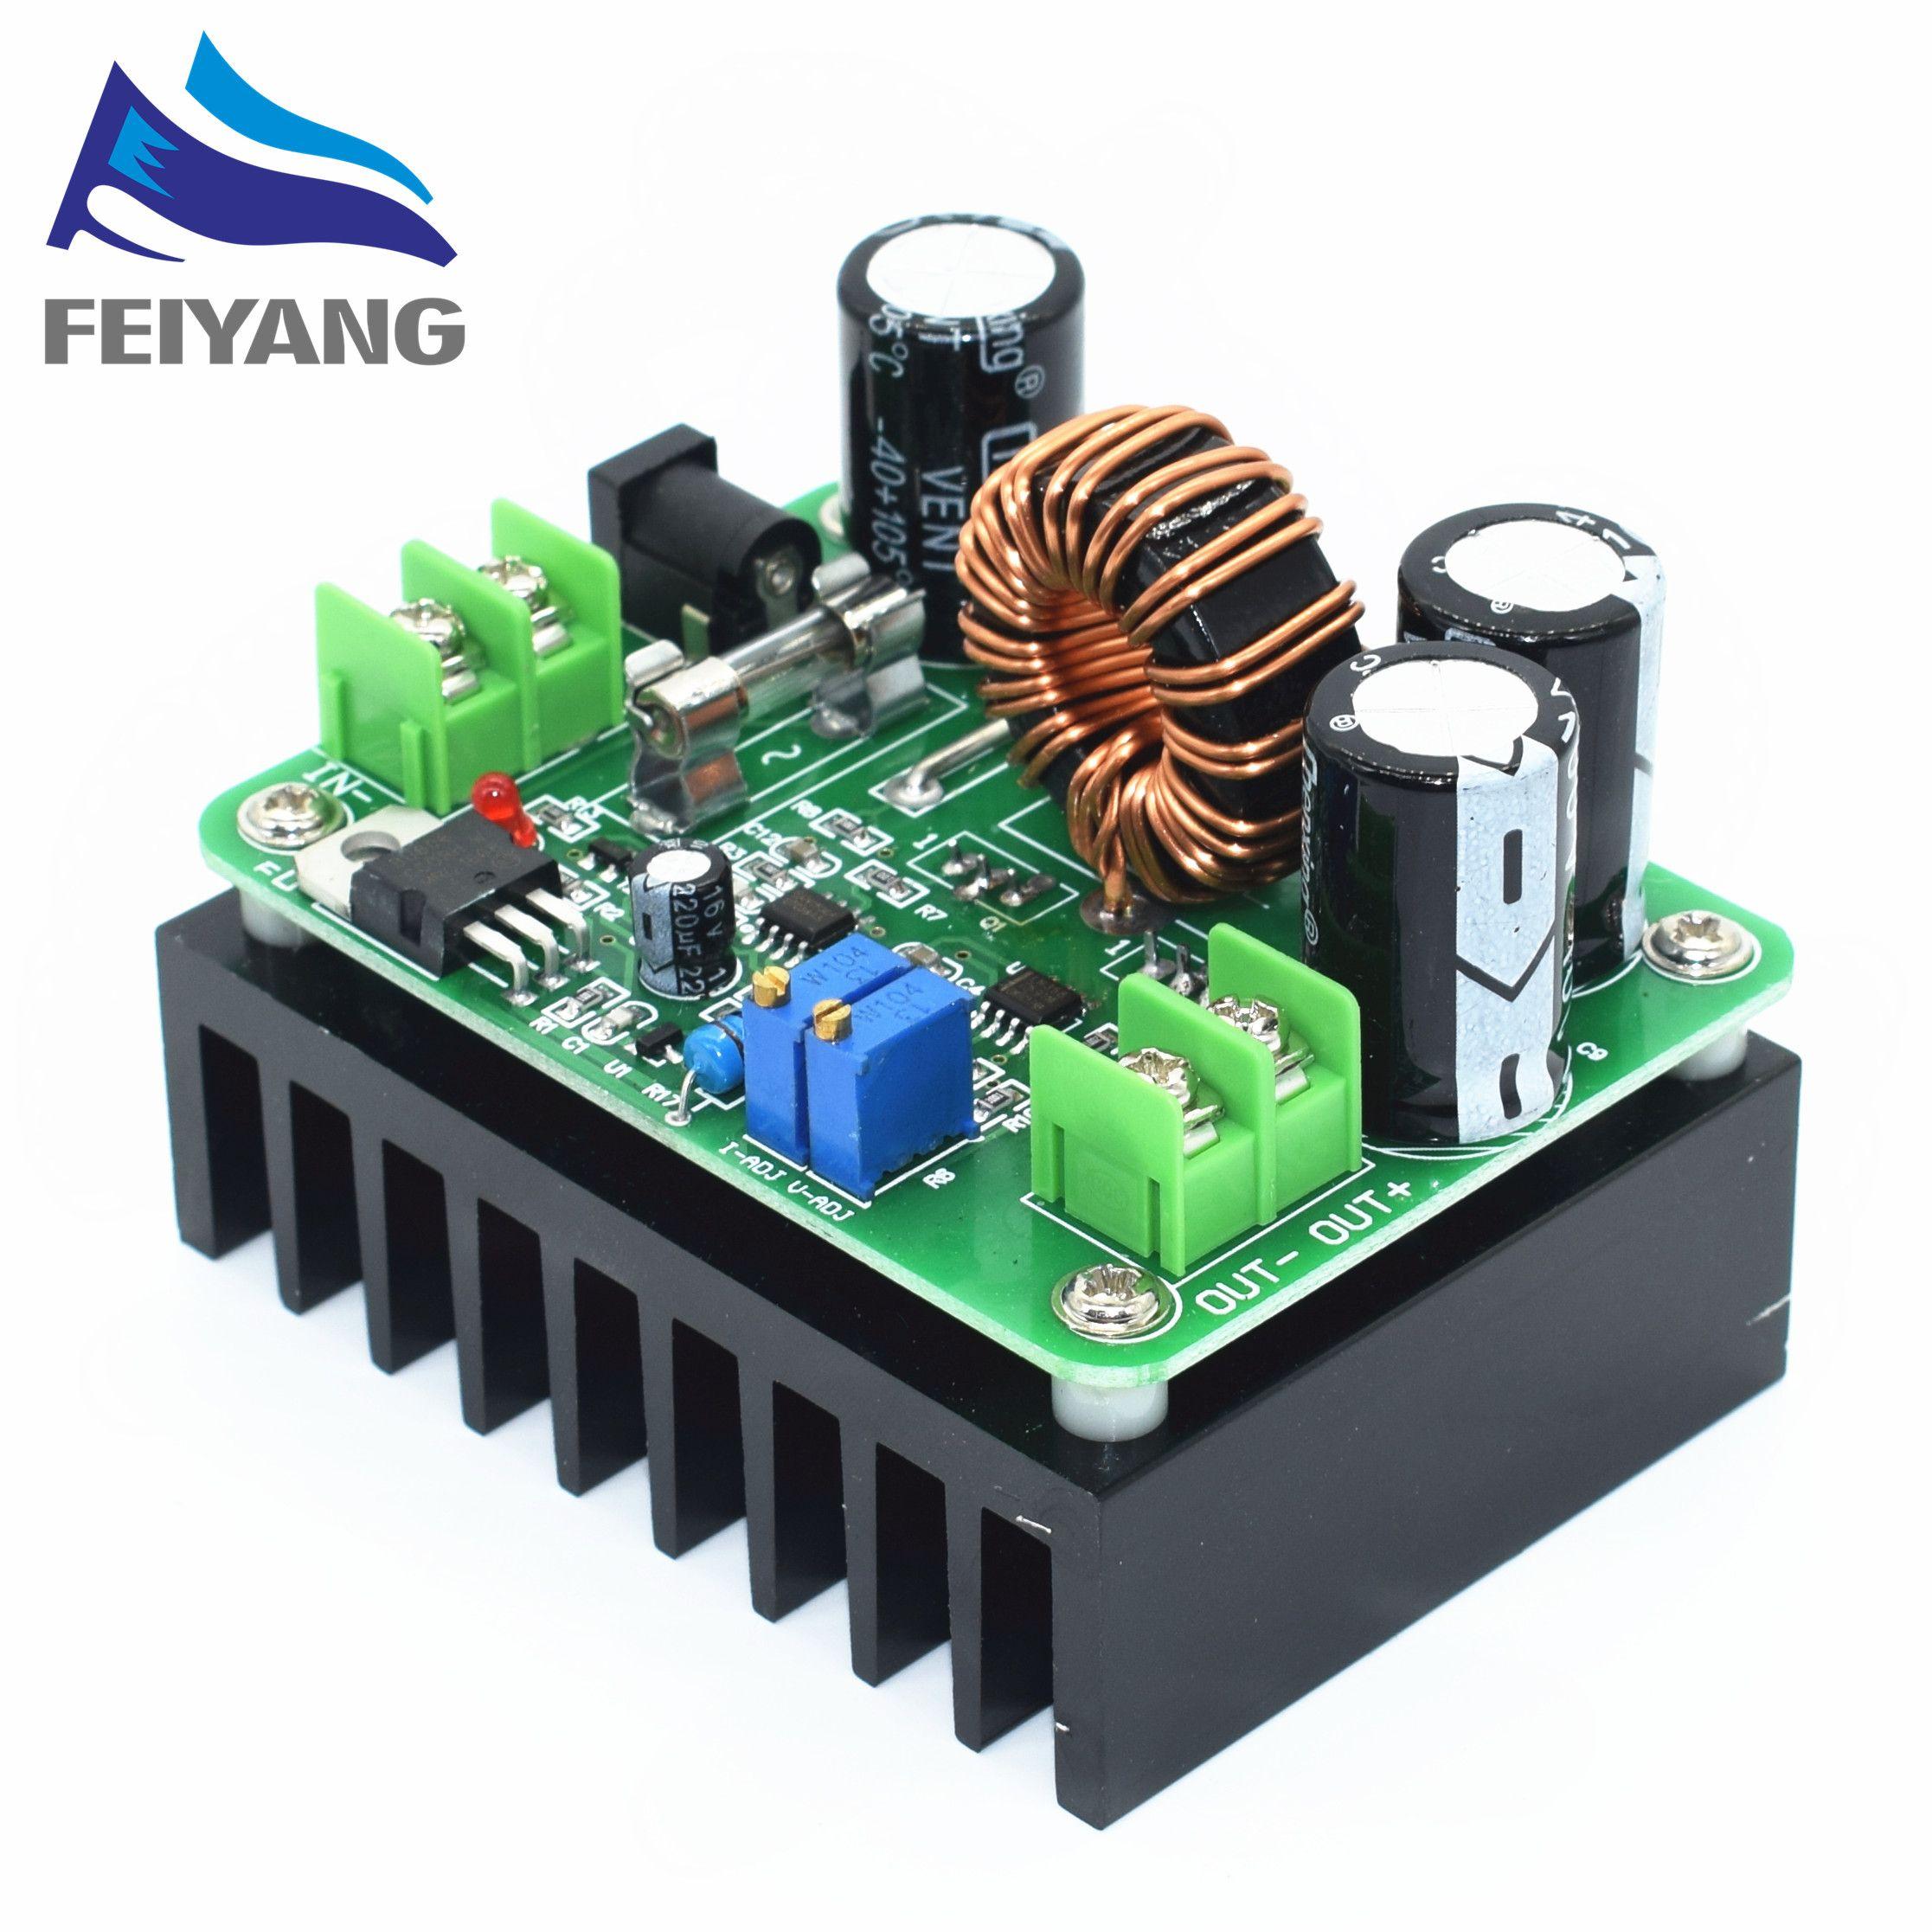 1pcs DC-DC 600W 10-60V to 12-80V Boost Converter Step-up Module car Power Supply